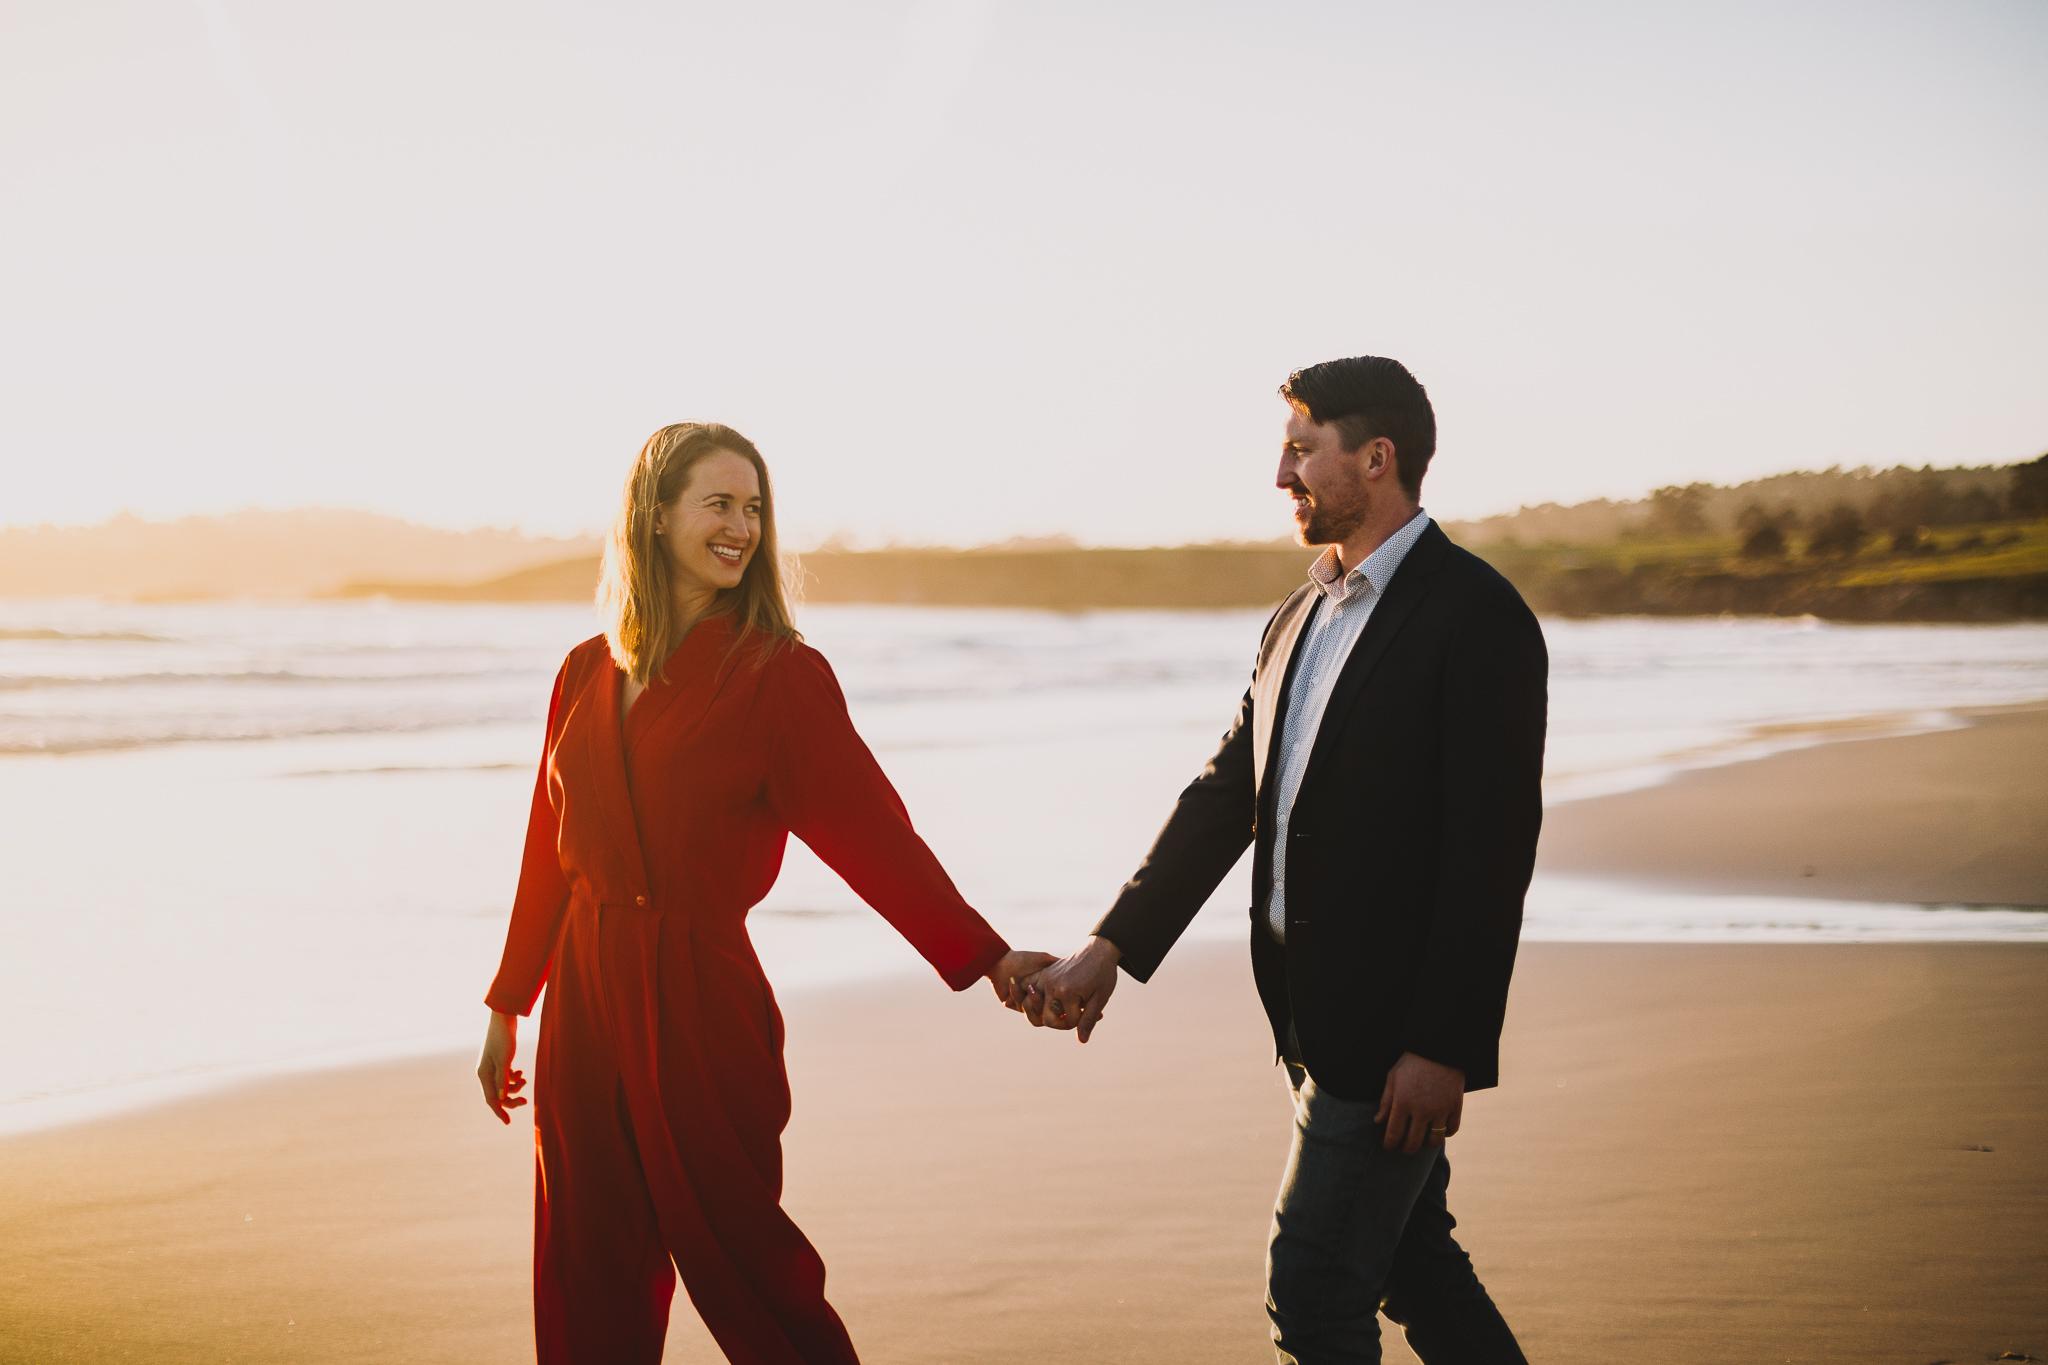 Archer Inspired Photography Carmel Beach California Wedding Engagement Lifestyle Anniversary Natural Light Photographer-16.jpg